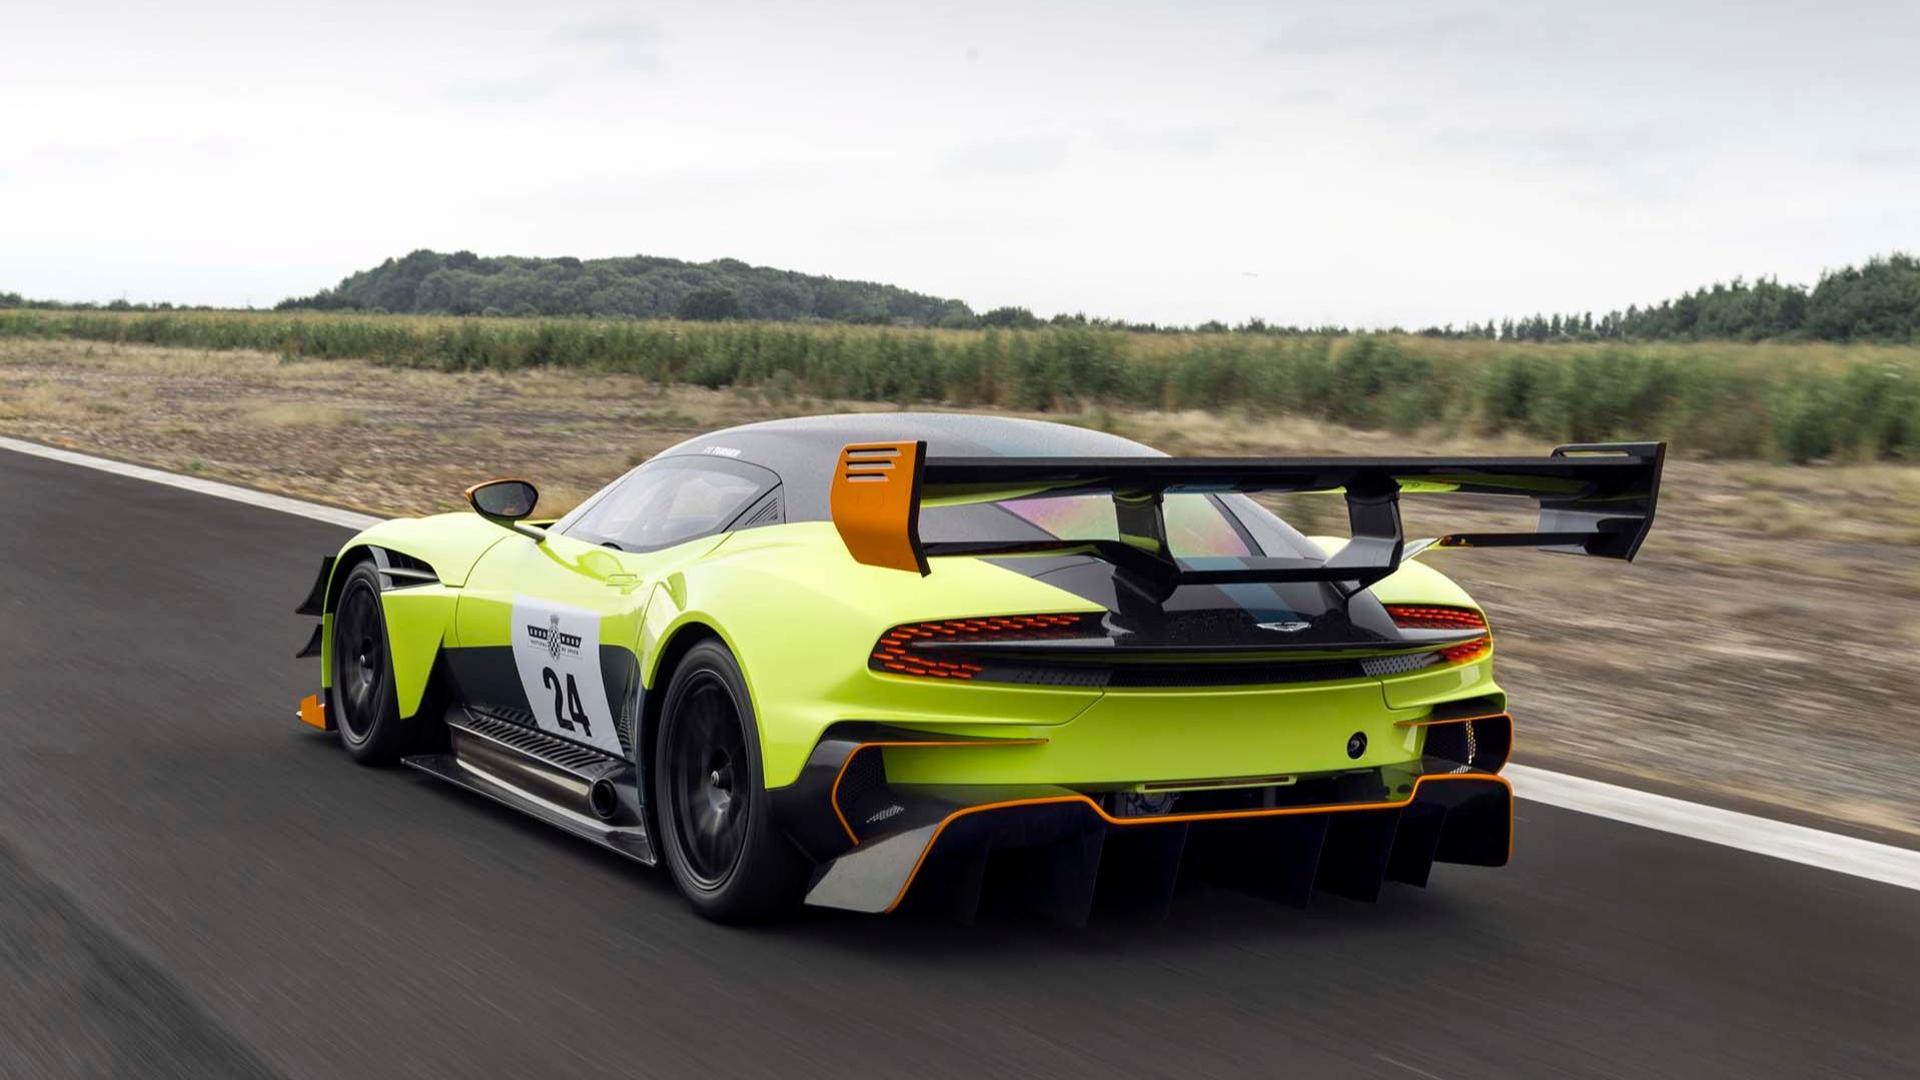 Aston Martin Vulcan Akhirnya Akan Turun Di Balapan Resmi